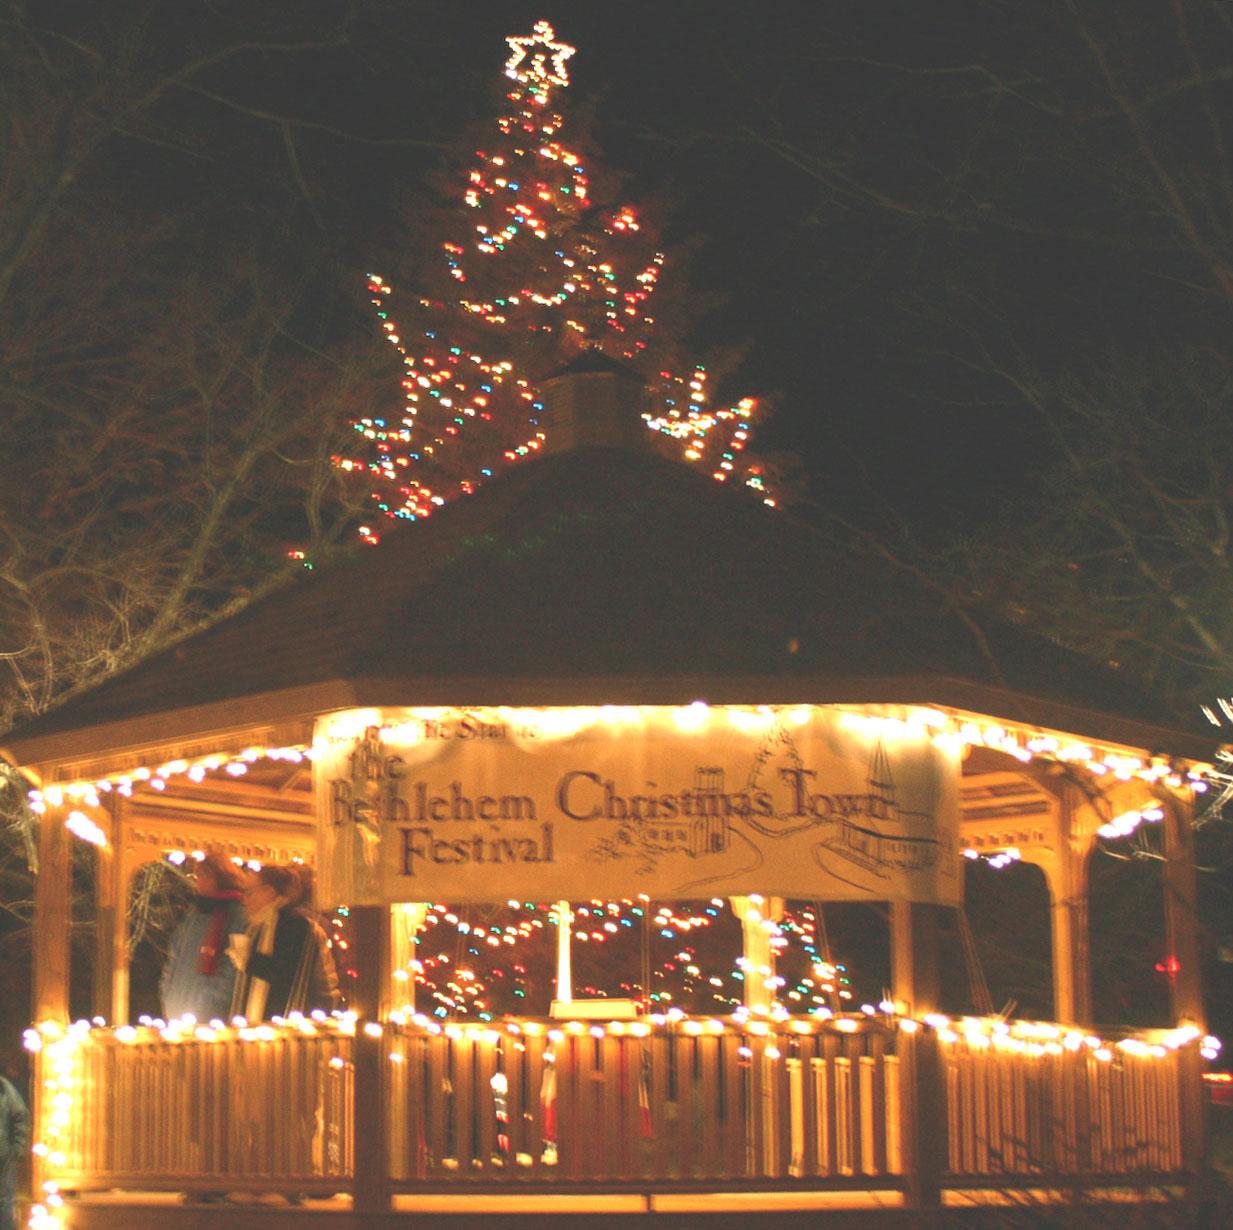 Bethlehem Ct Christmas Fair 2020 Bethlehem Christmas Town Festival | Visit CT